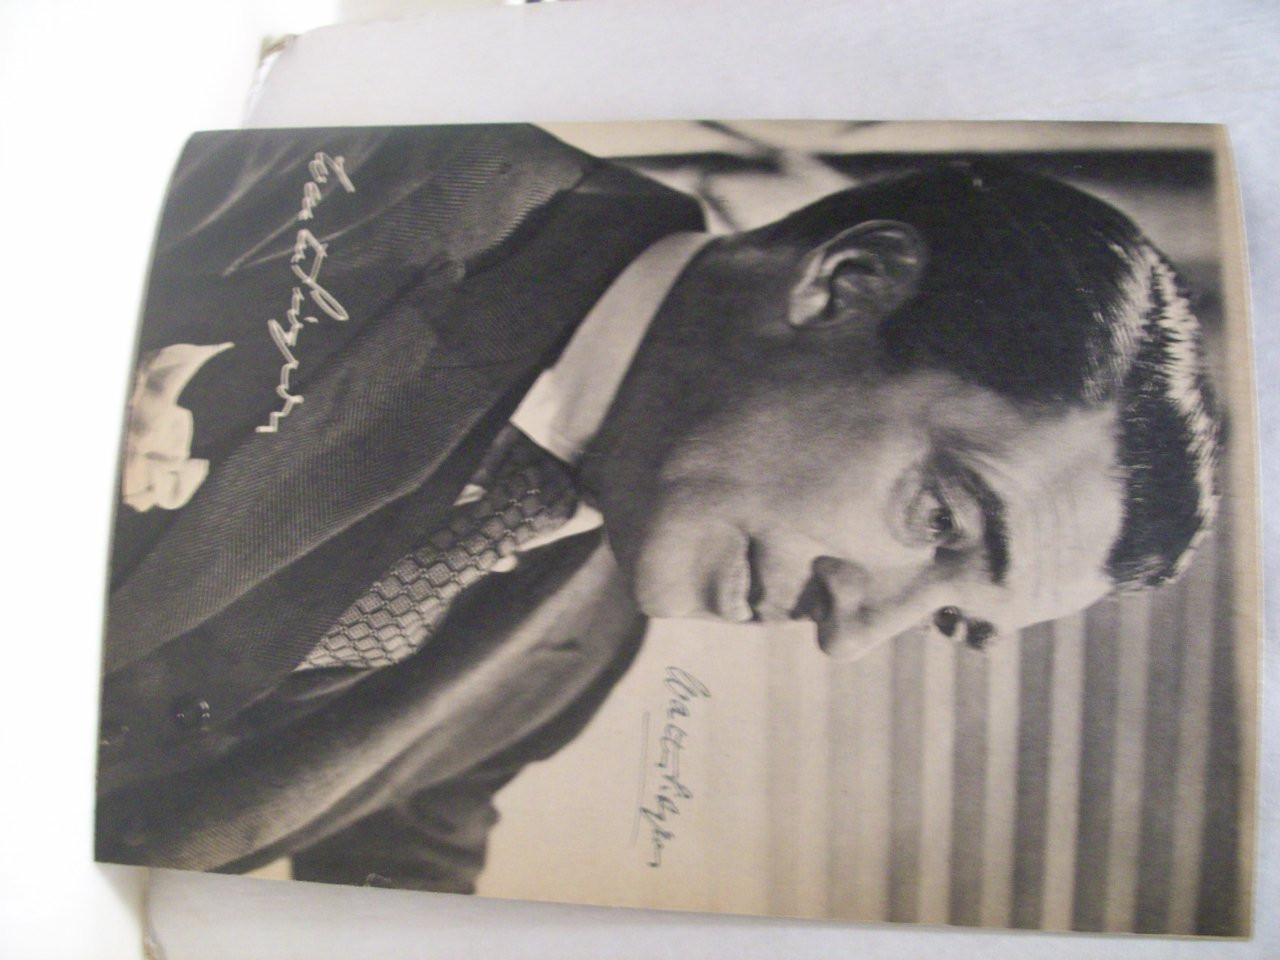 Pidgeon, Walter Photo Signed Autograph